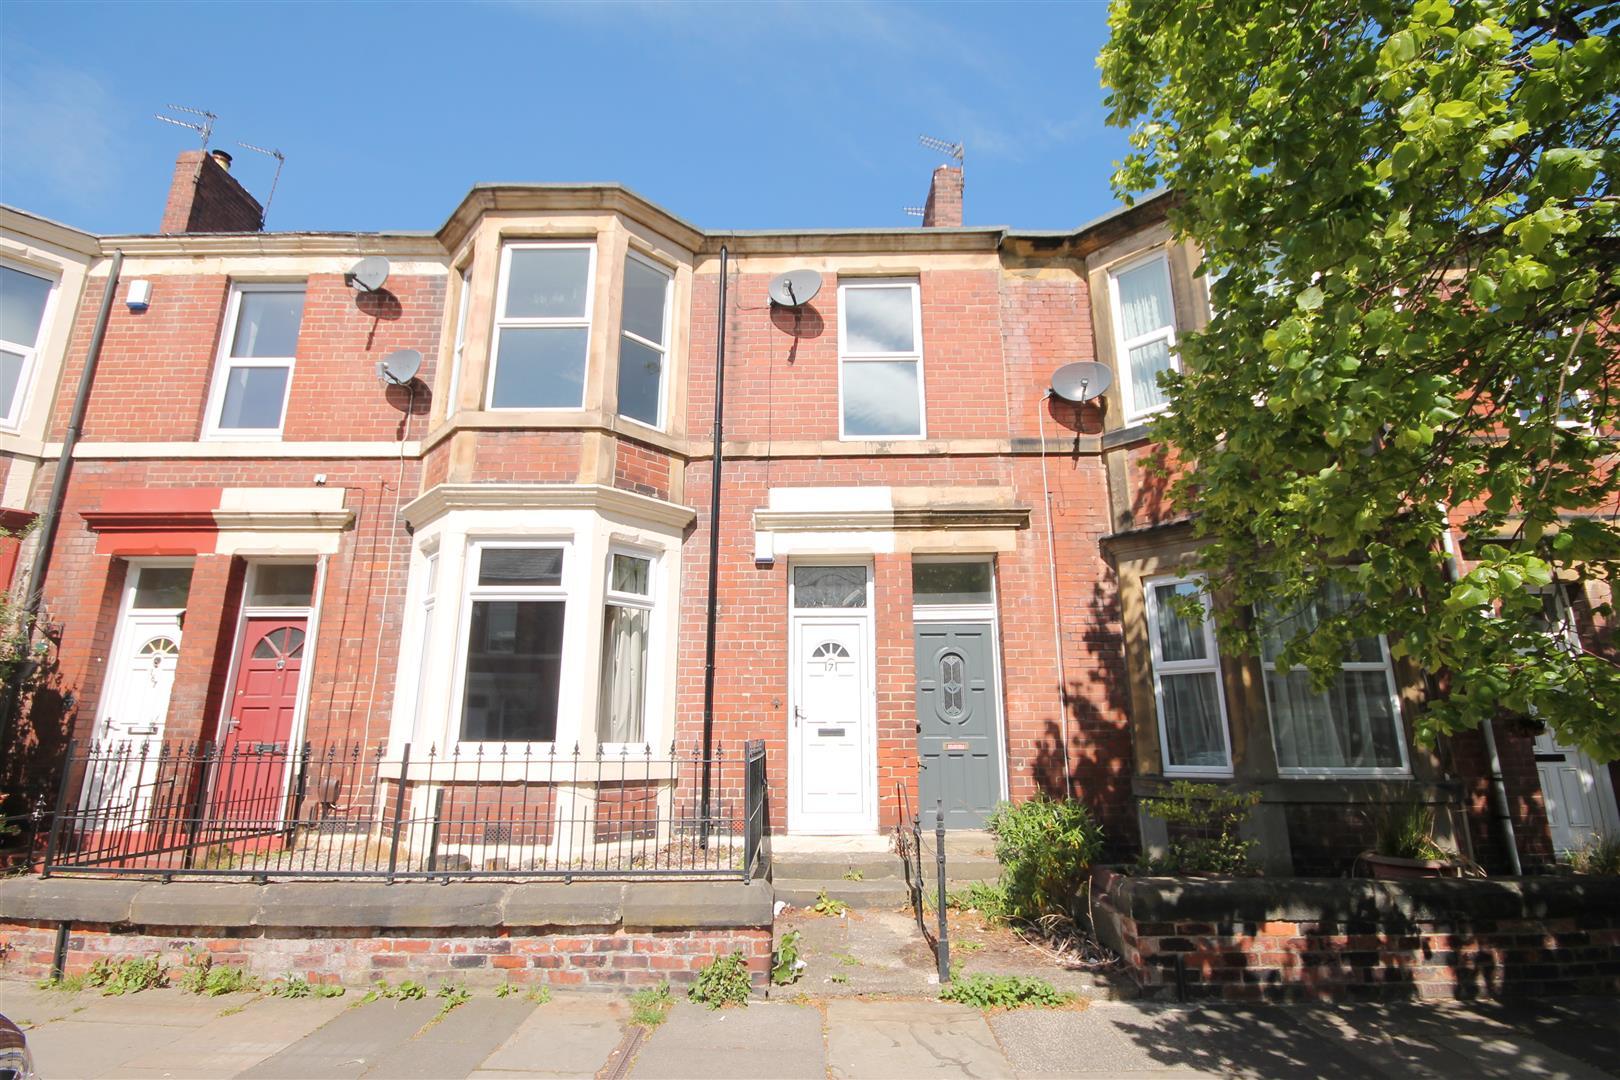 Helmsley Road Newcastle Upon Tyne, 2 Bedrooms  Flat ,Sold (STC)